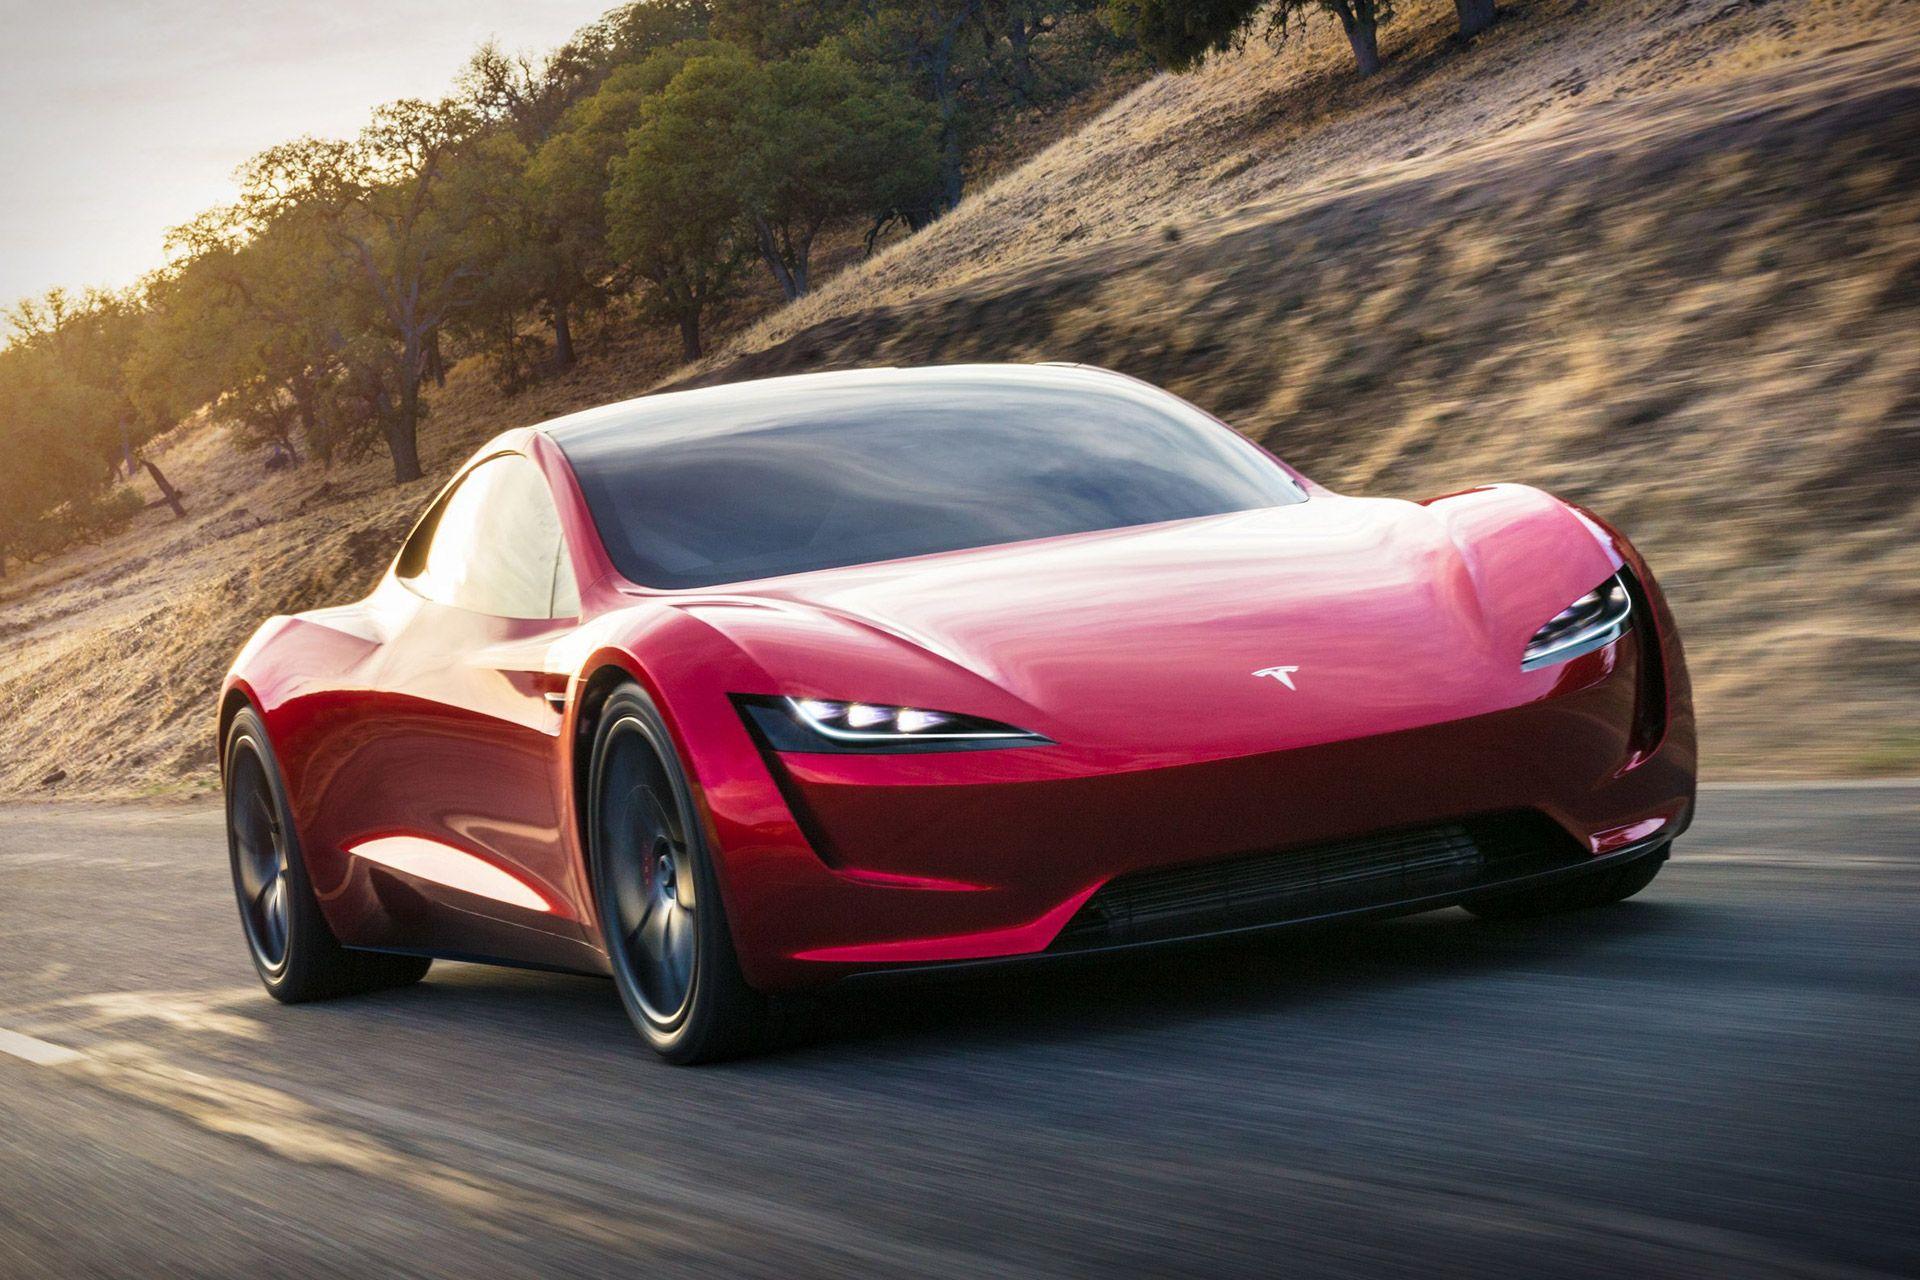 Tesla Roadster Tesla Roadster New Tesla Roadster Tesla Supercar